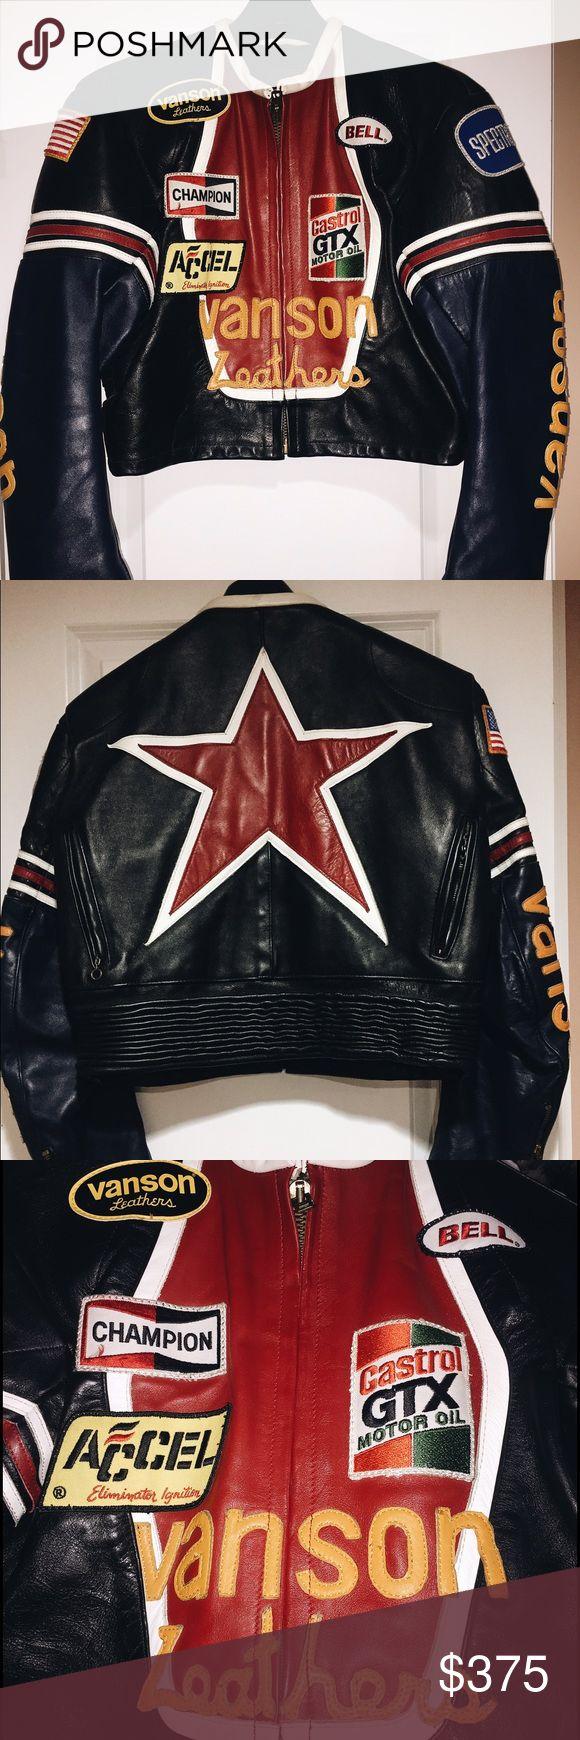 Vanson leather motorcycle gloves - Vanson Leather Jacket